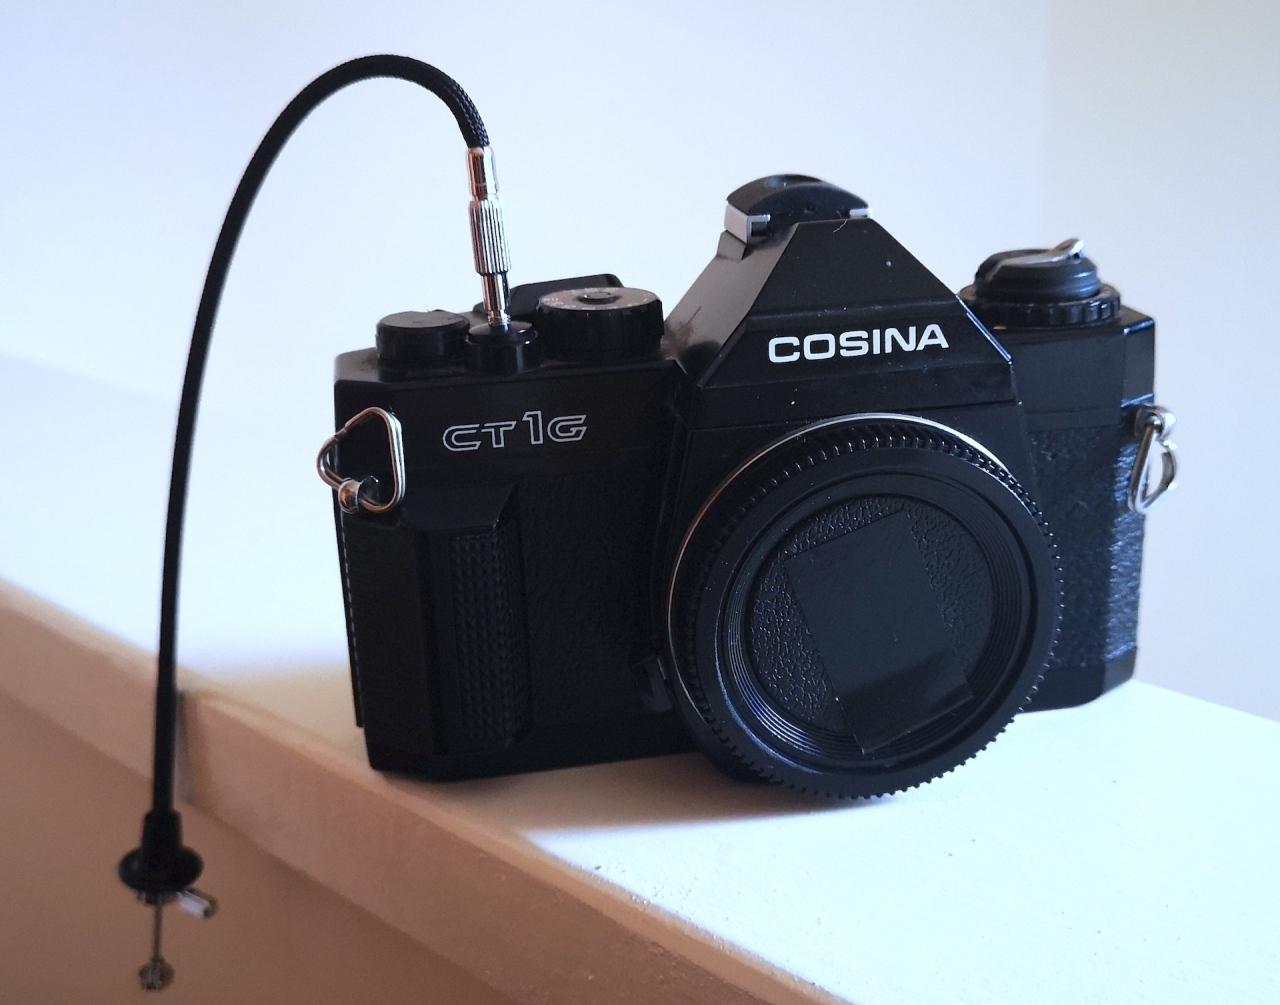 Cosina CT1G (with pinhole lenscap)